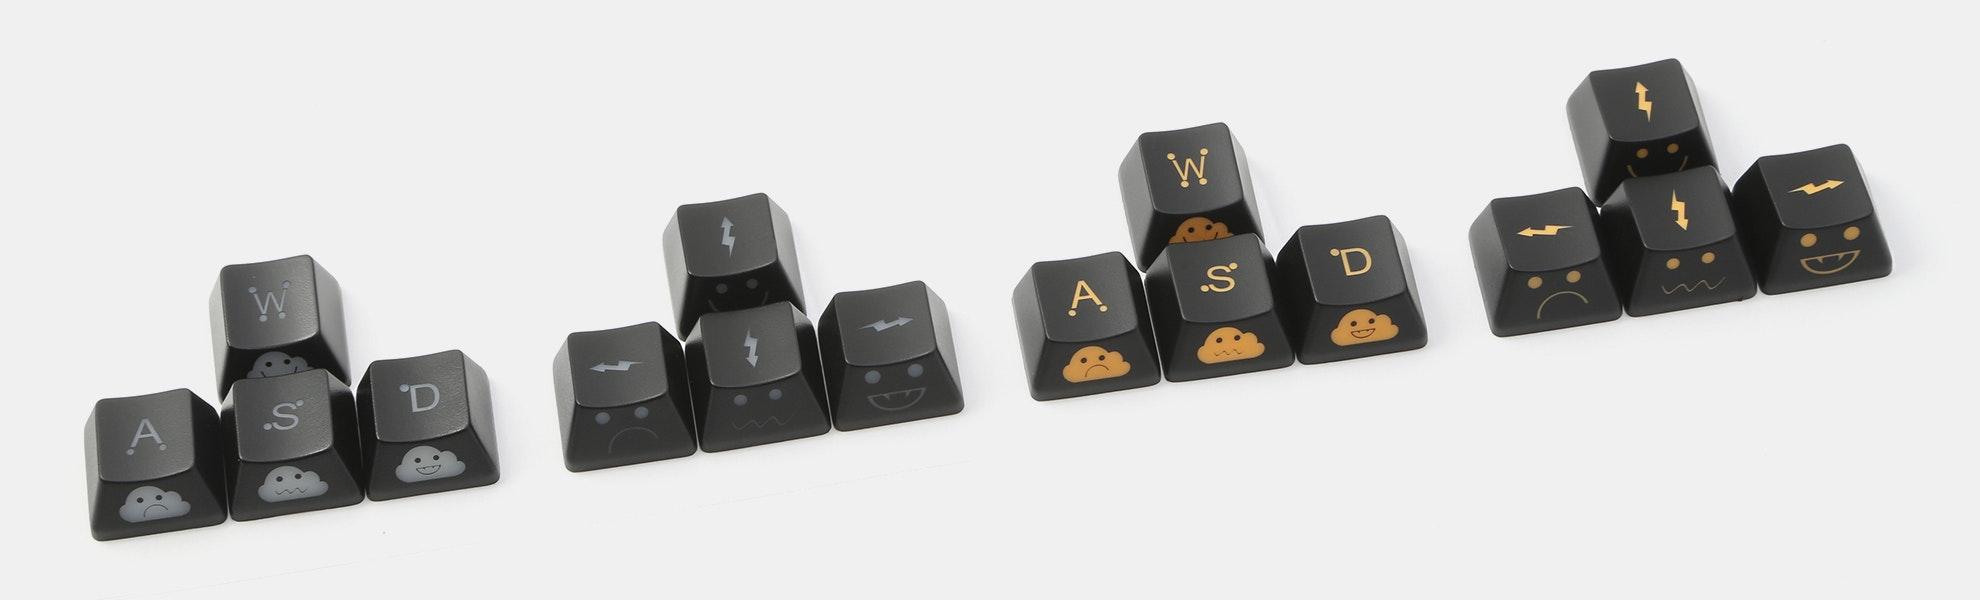 WASD + Arrow Shine-Through Novelty Keycaps